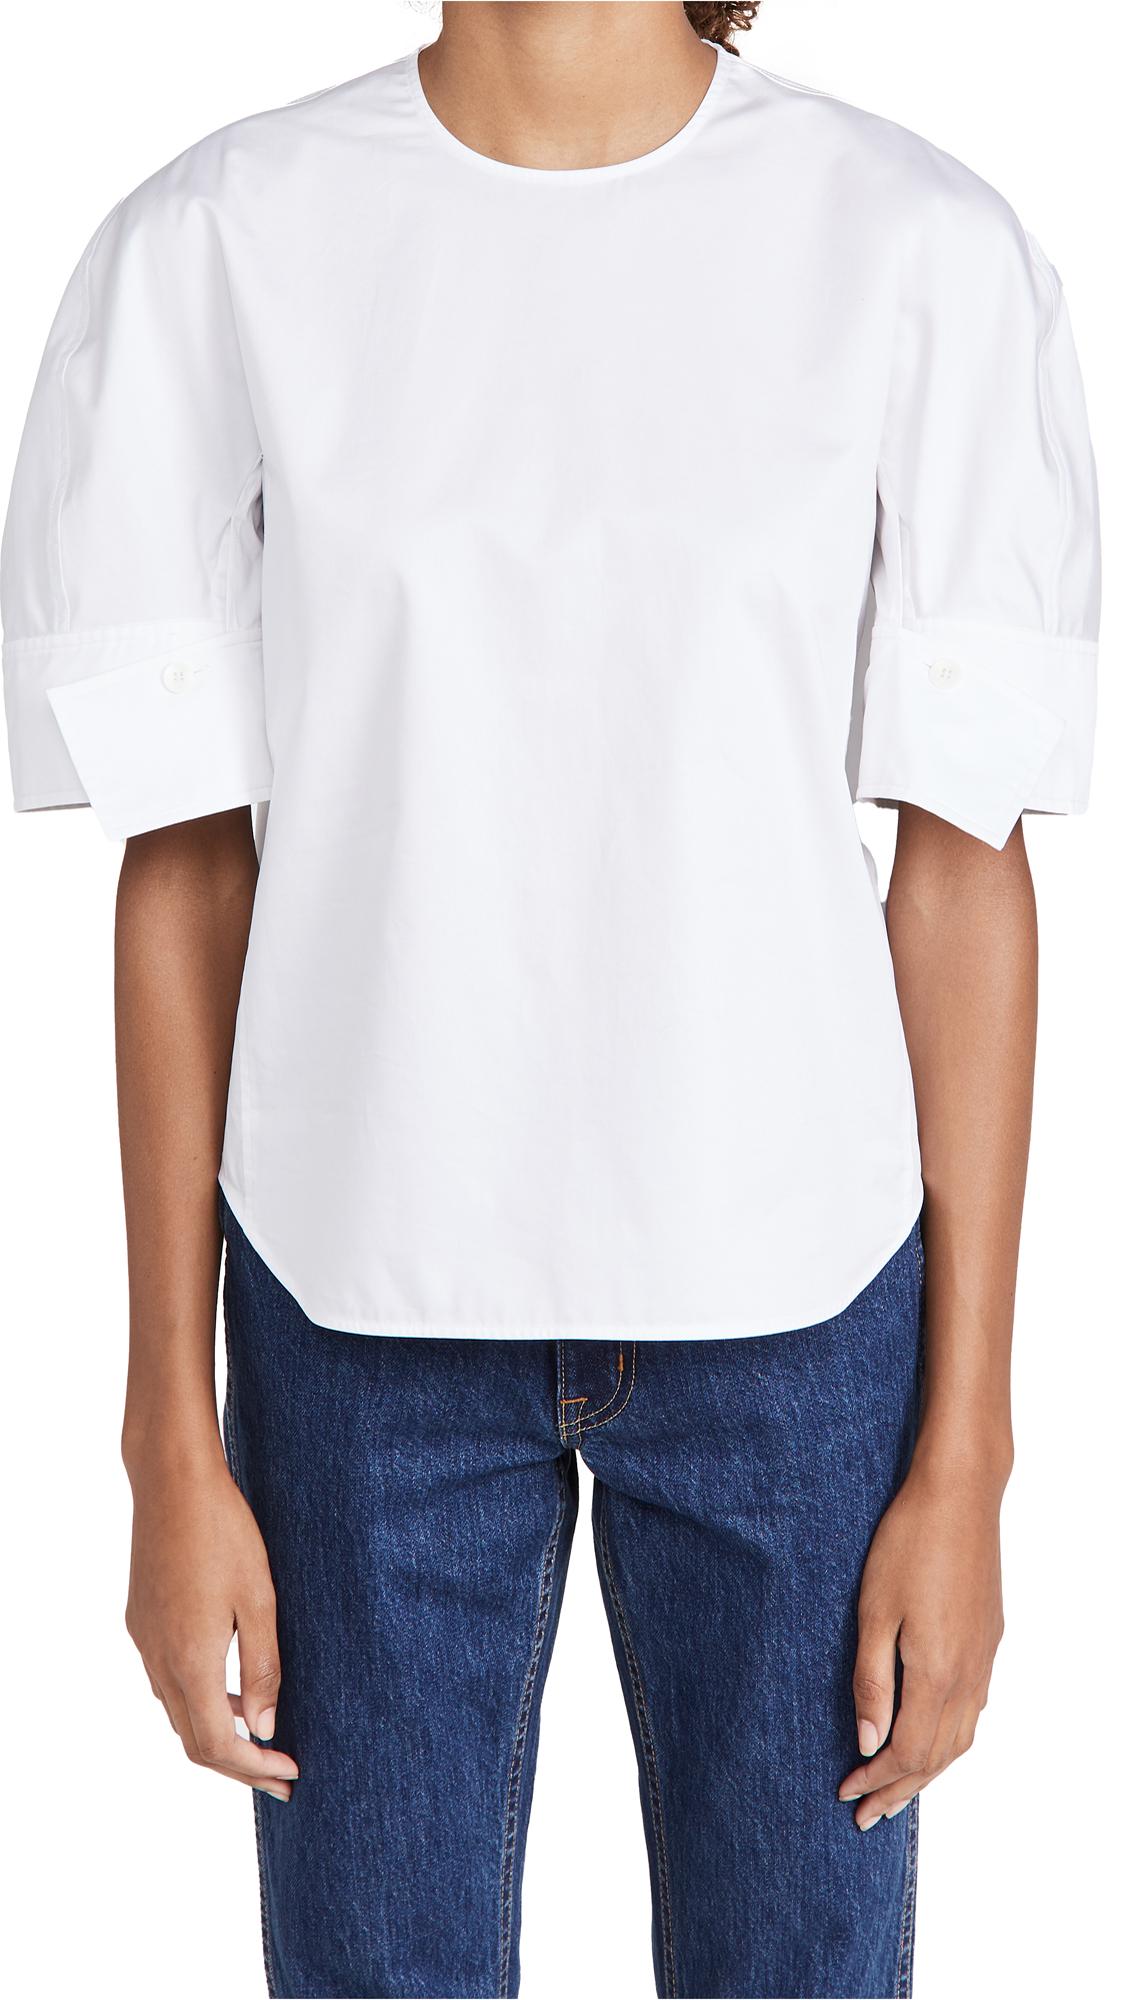 Tibi Reverse Sleeve Top